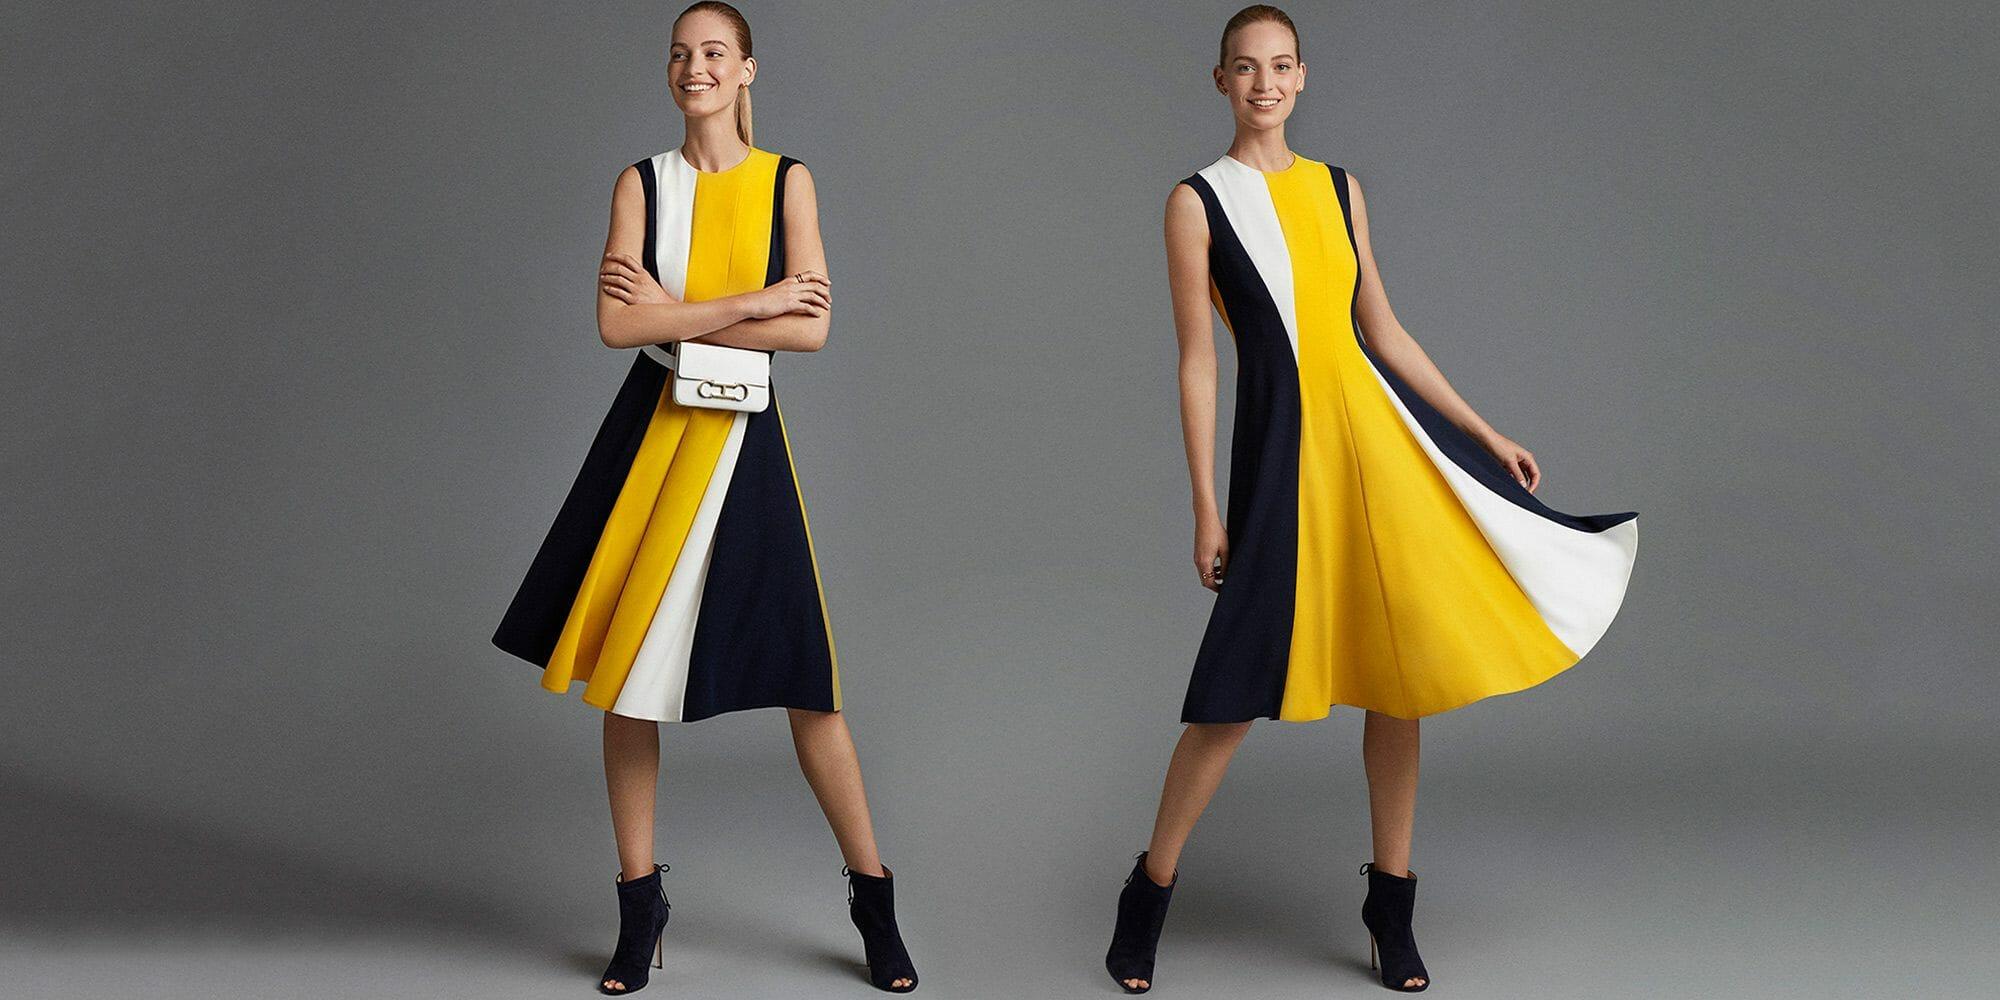 ch carolina herrera women wearing black white yellow dress insignia bag light dots